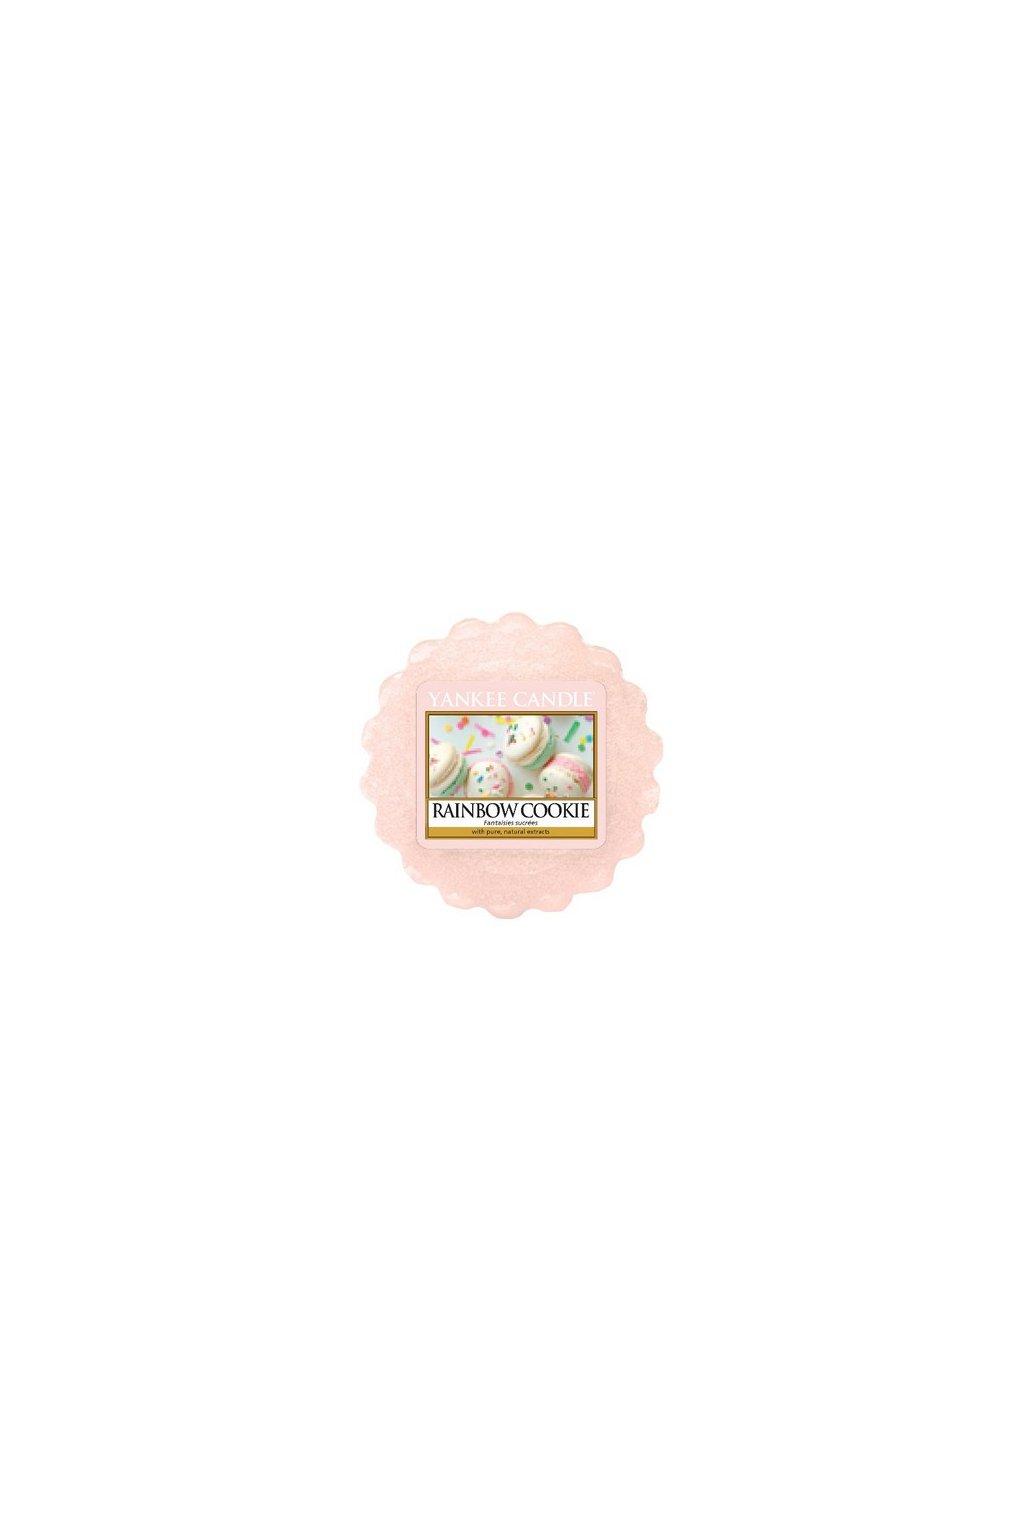 YANKEE CANDLE RAINBOW COOKIE 22g